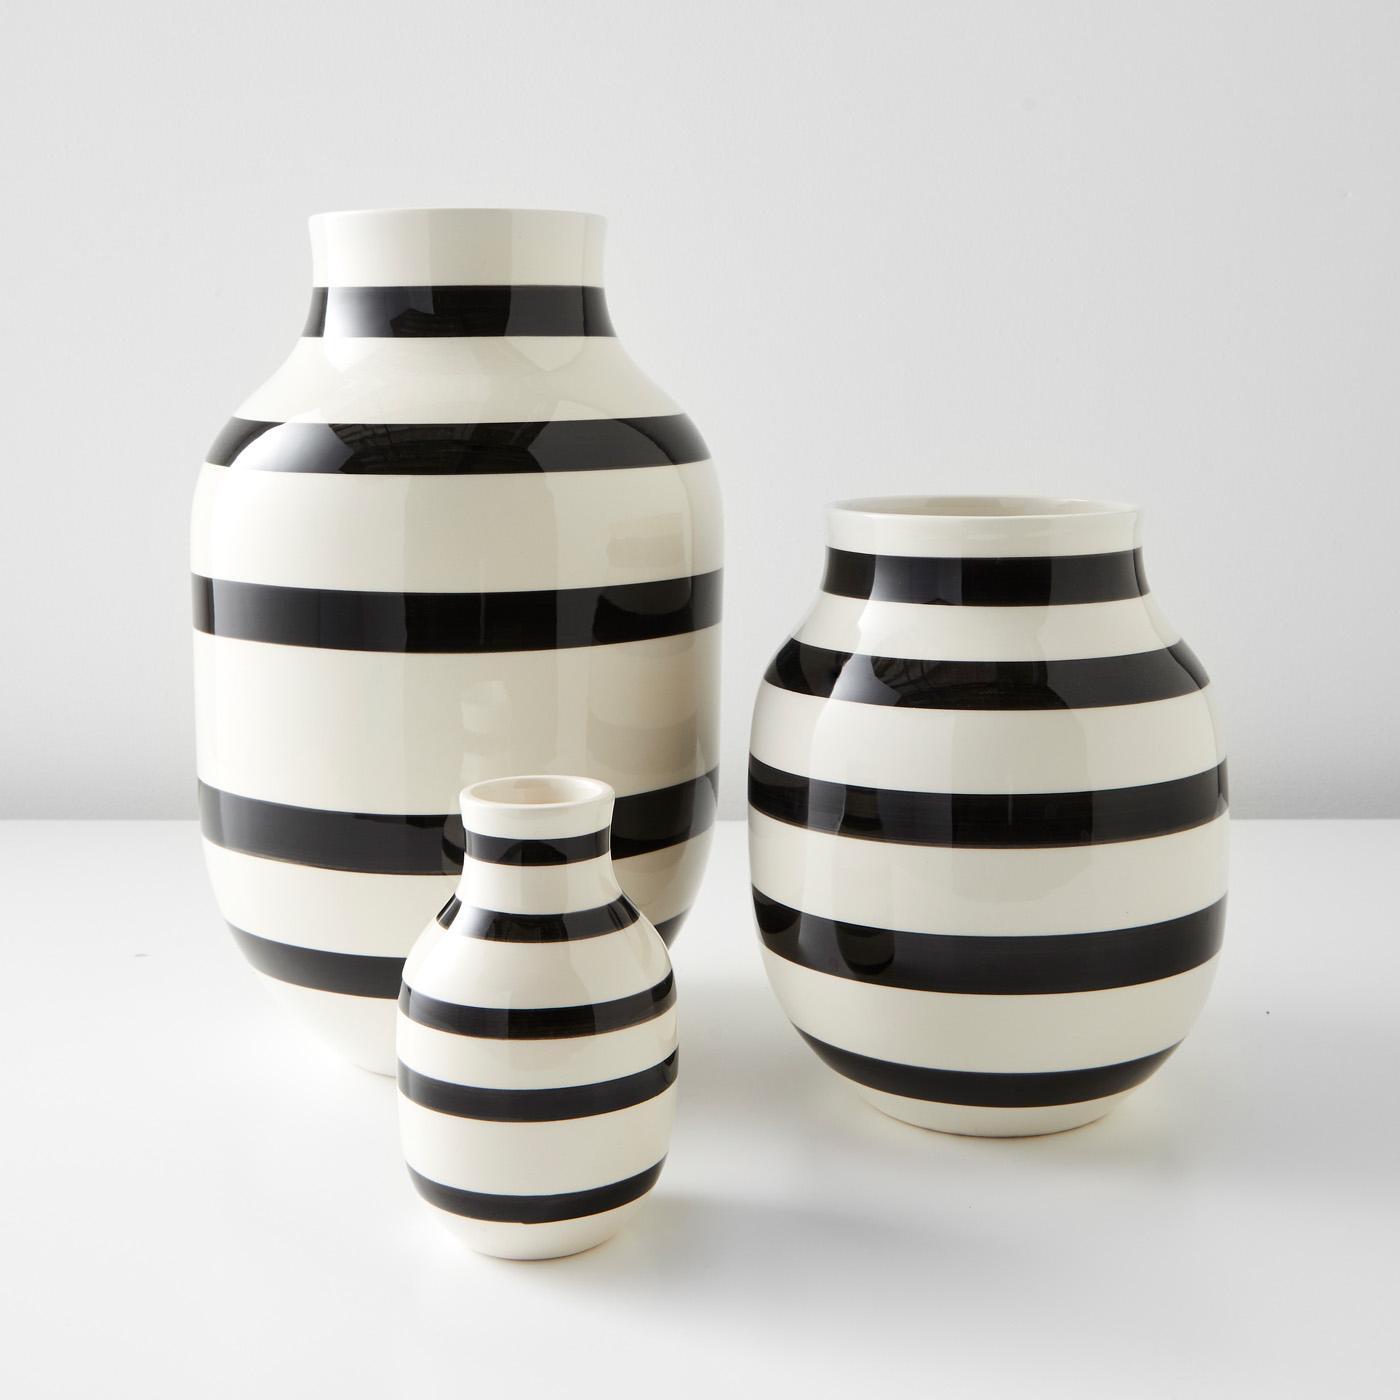 Omaggio Black Vases